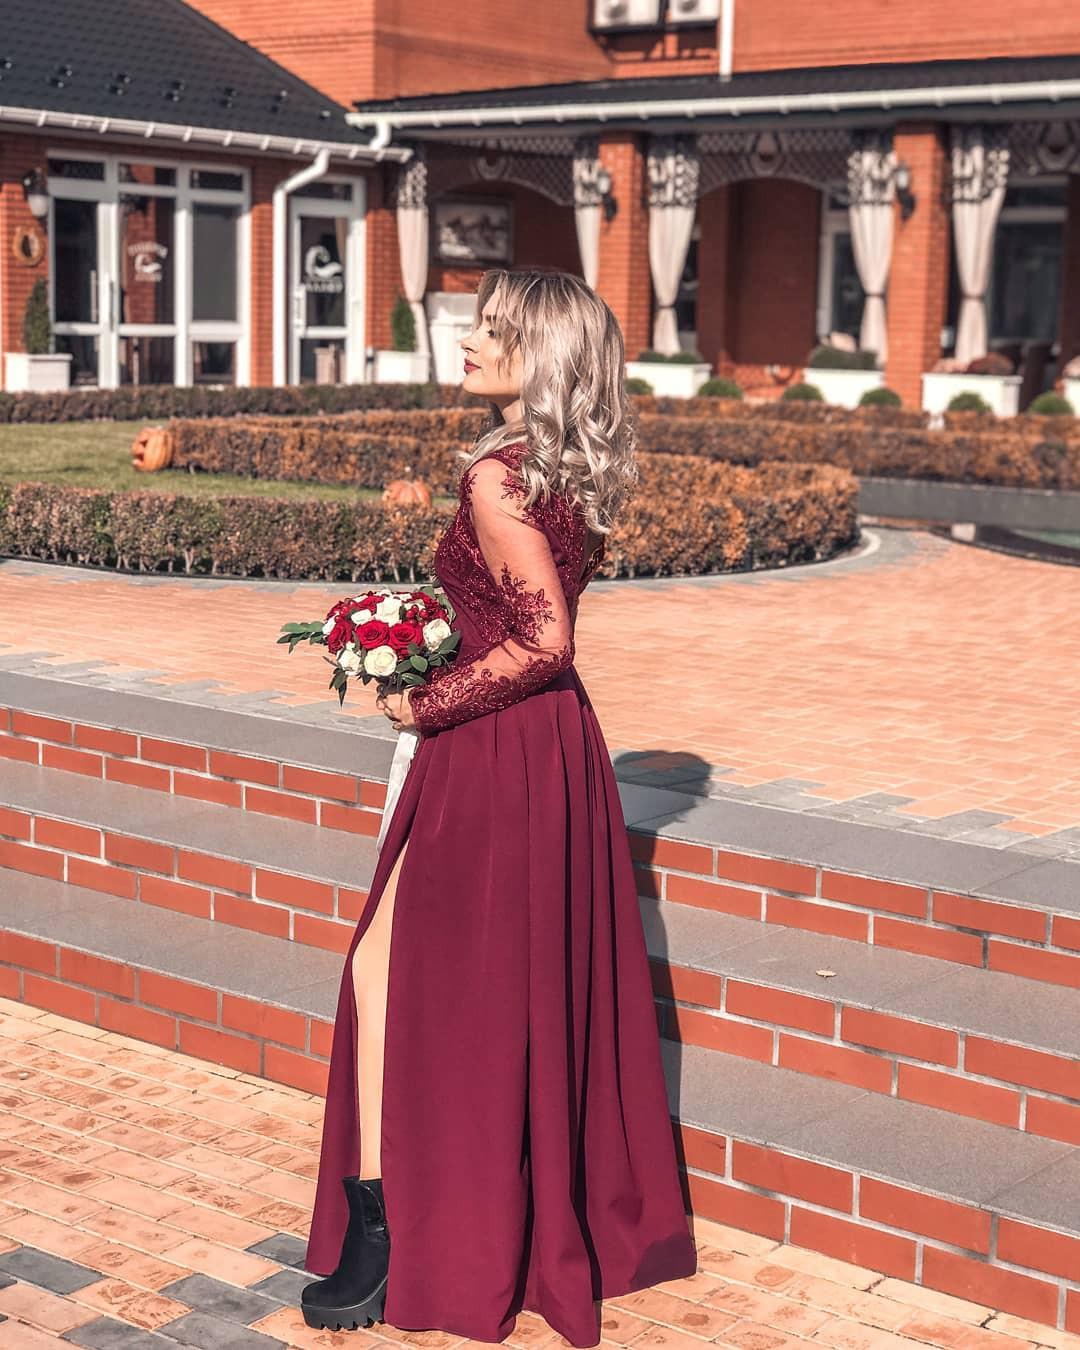 Aleksandra Glance dress, gown formal wear outfits for women